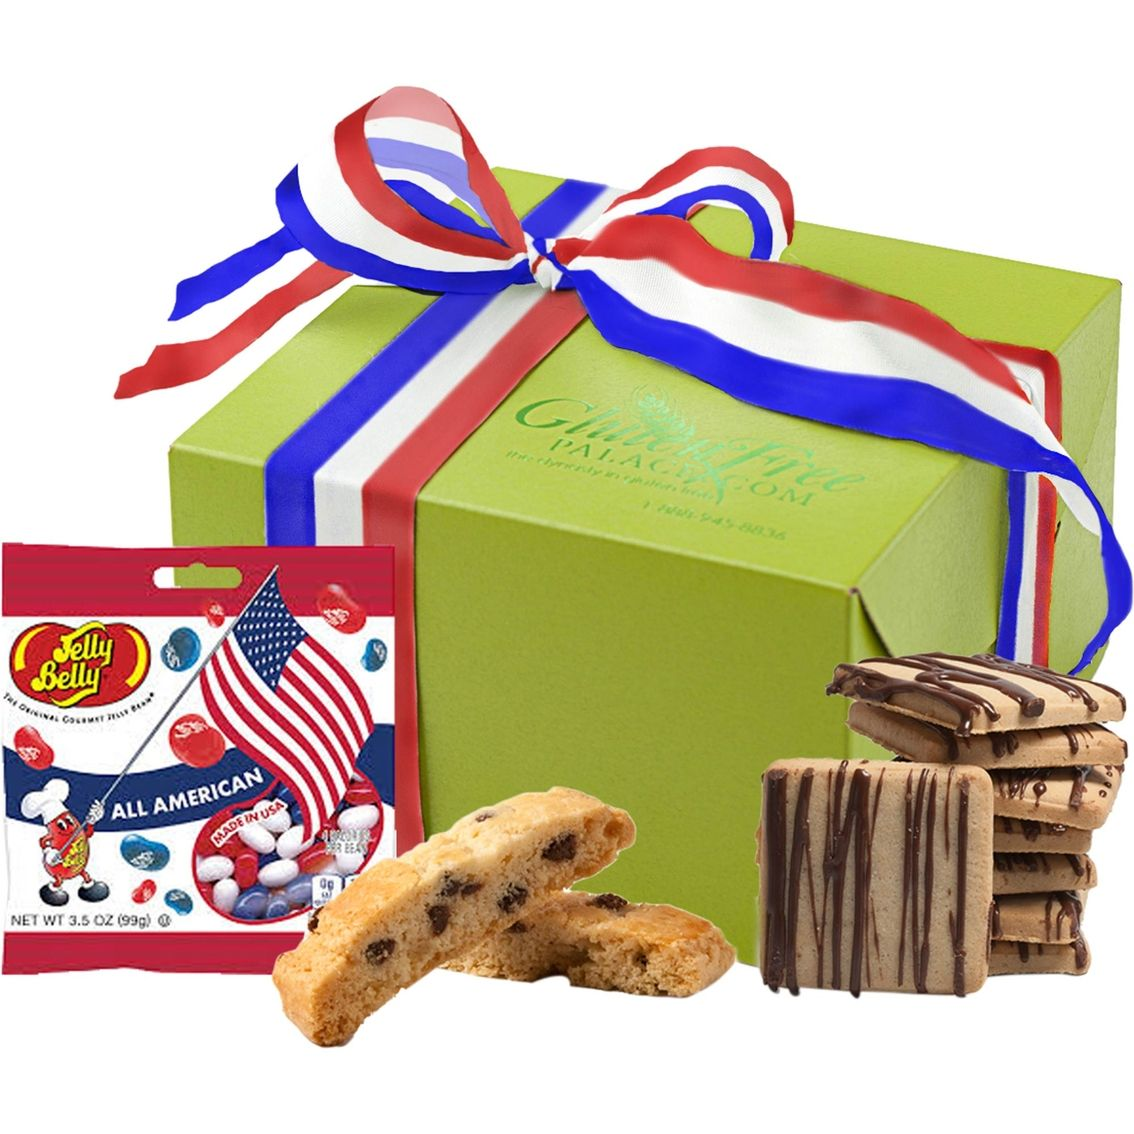 Celebrate america the glutenfree way with this medium